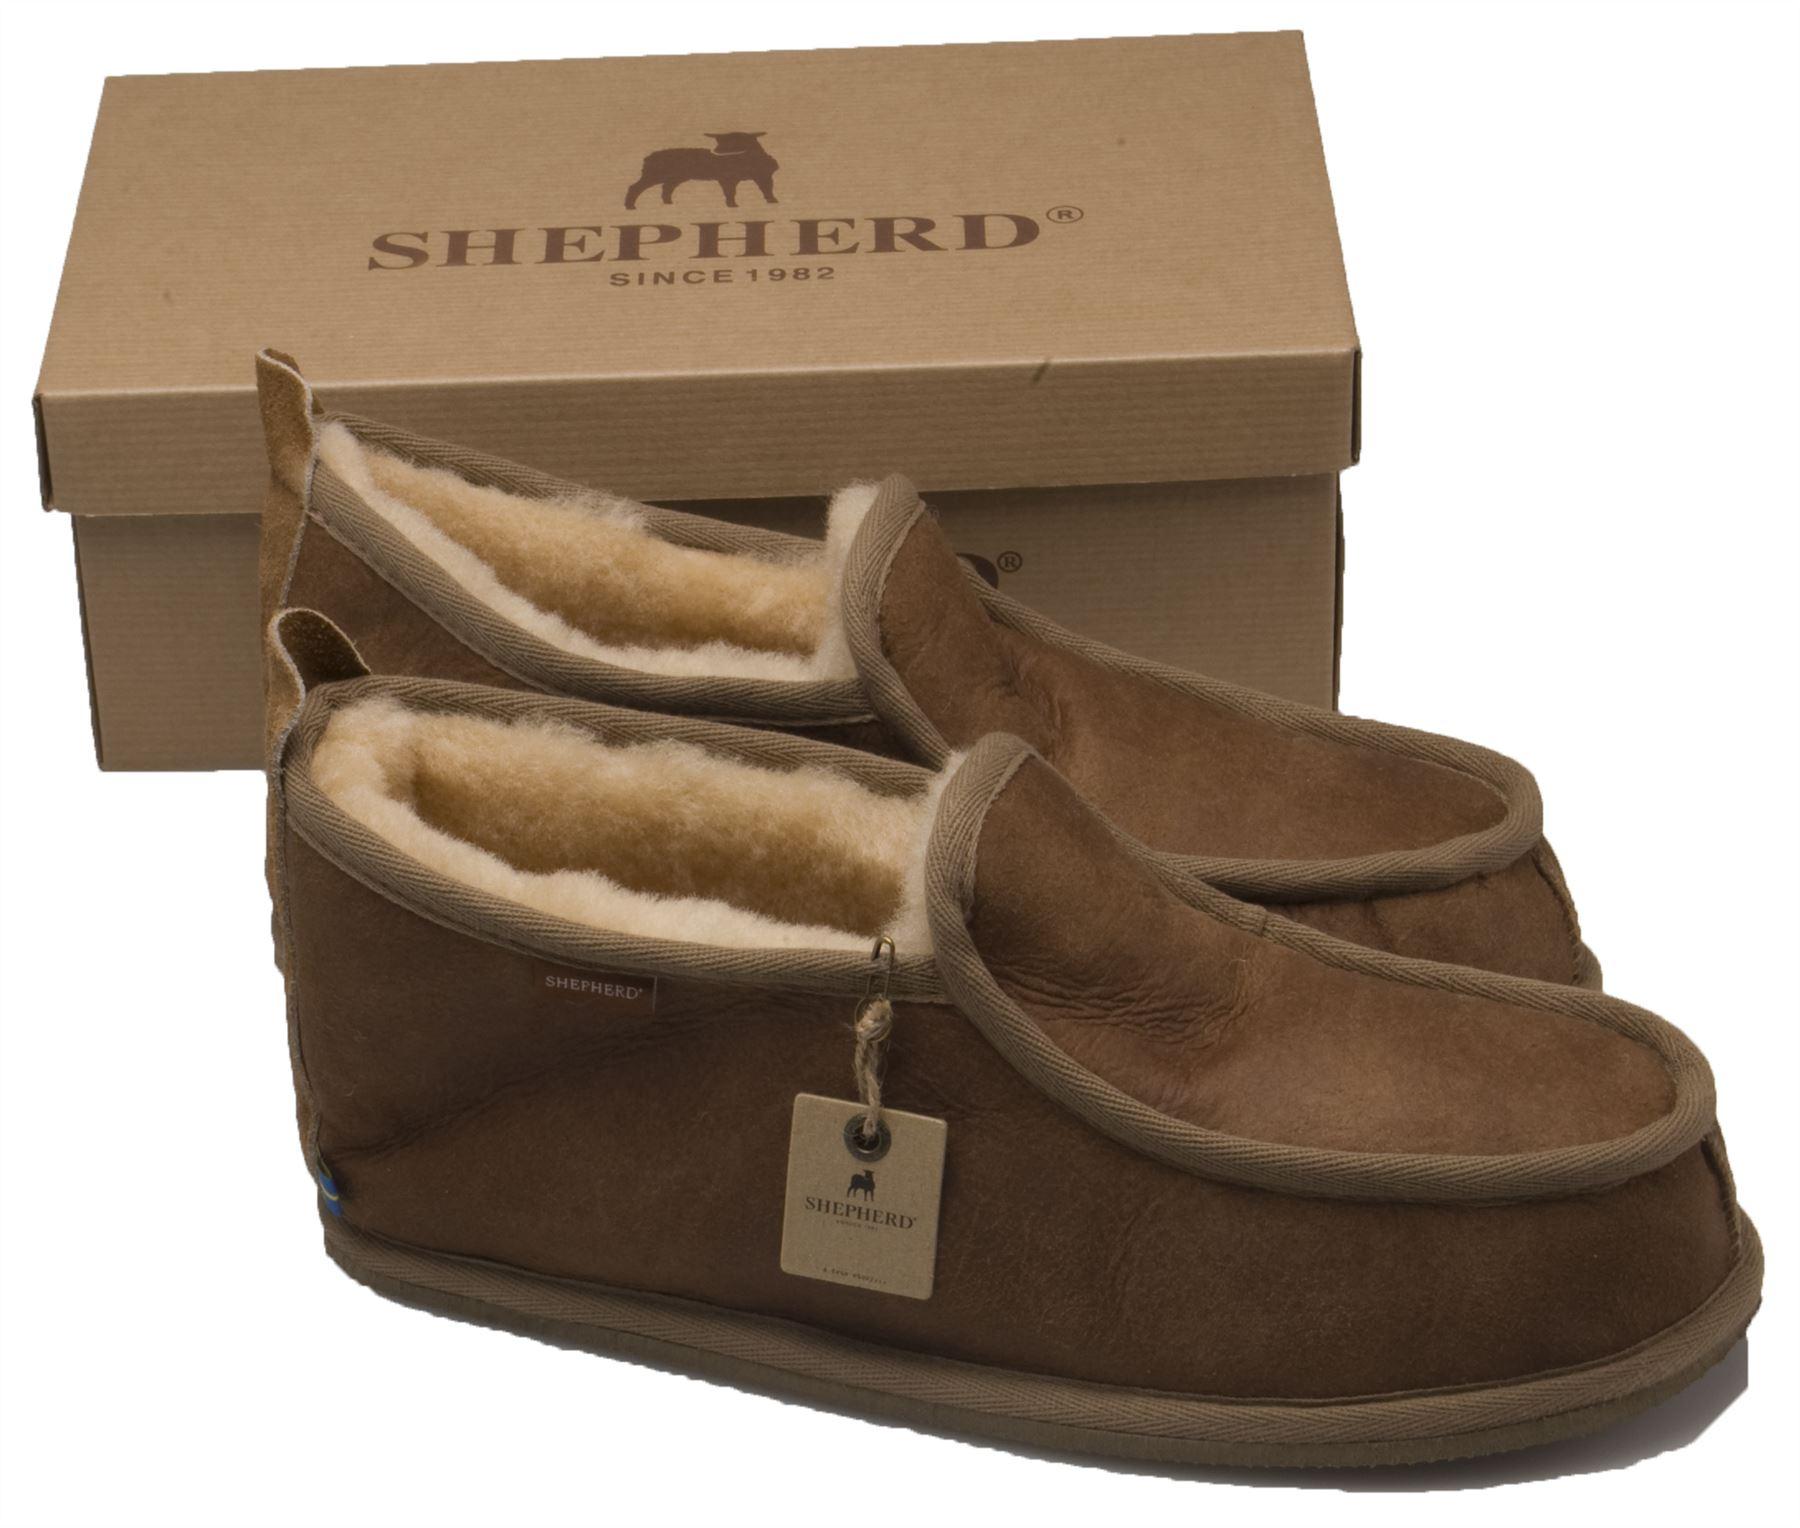 68c0d523e29 Details about Shepherd Mens Genuine Sheepskin Slippers Hard Rubber Sole  Real ARNE 475